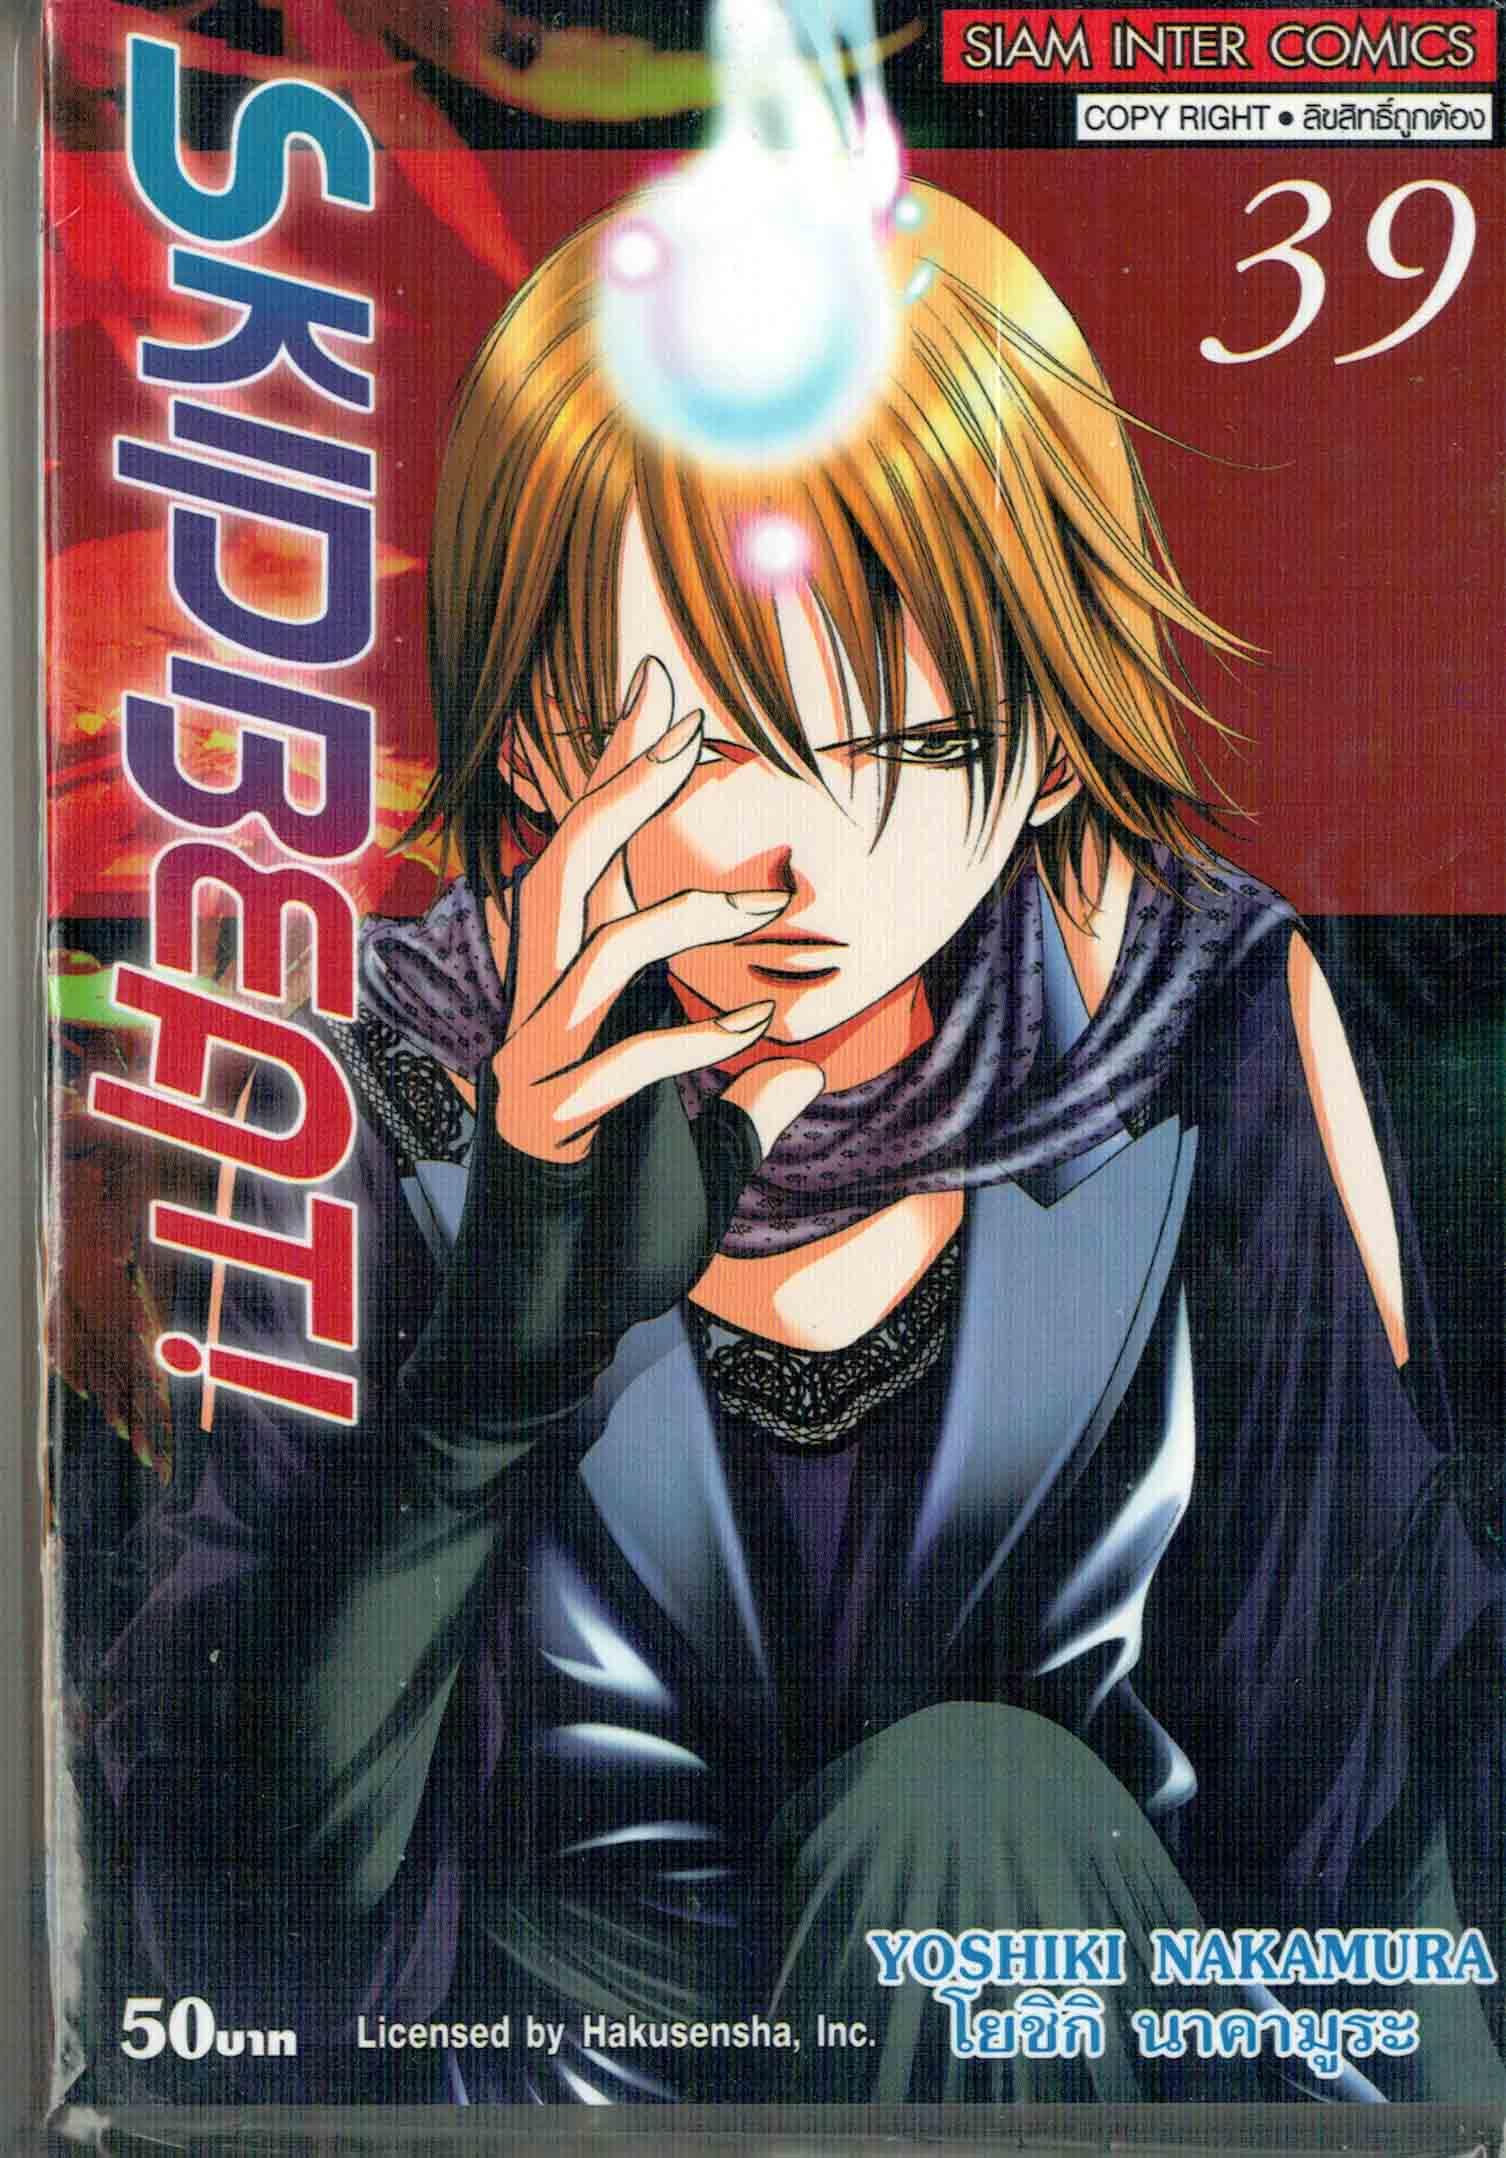 SKIP BEAT! เล่ม 39 : YOSHIKI NAKAMURA (โยชิกิ นาคามูระ)